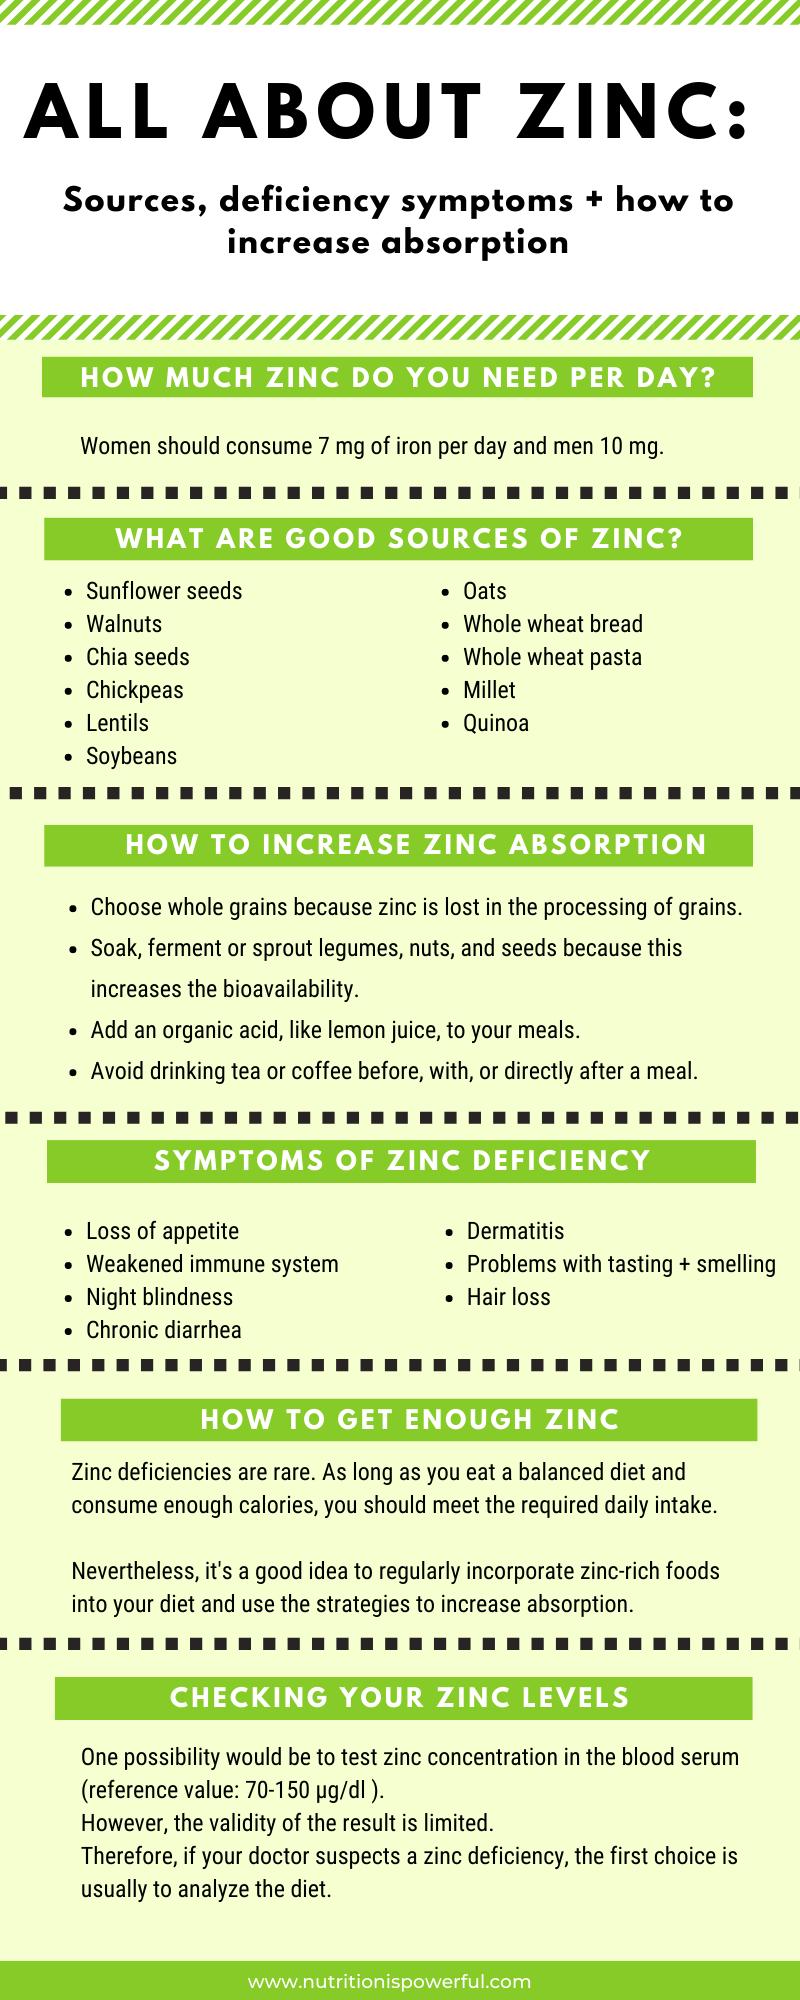 How To Avoid Zinc Deficiency List Of Zinc Rich Foods In 2020 Zinc Rich Foods Zinc Deficiency Foods High In Zinc